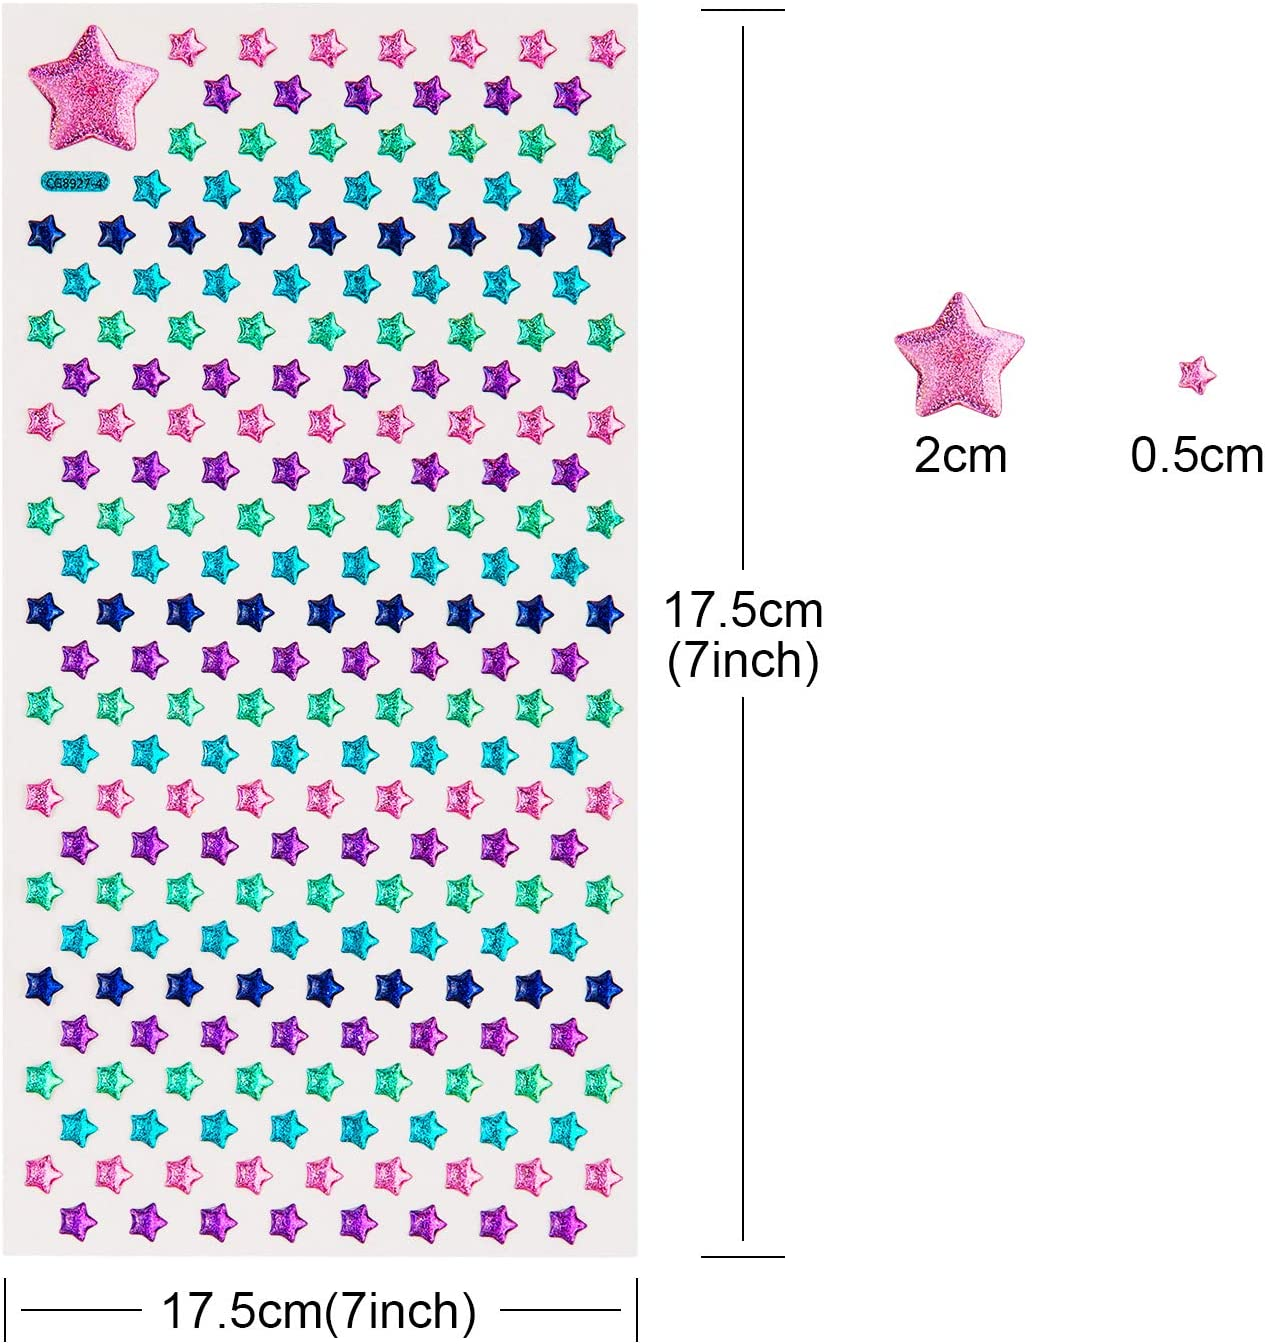 SAVITA 2000 4 Sheet Stick on Earrings 3D Gem Stickers Glitter Sparkle Crystal Stickers Sticker Earrings for Girls Multiple Colors /& Shapes